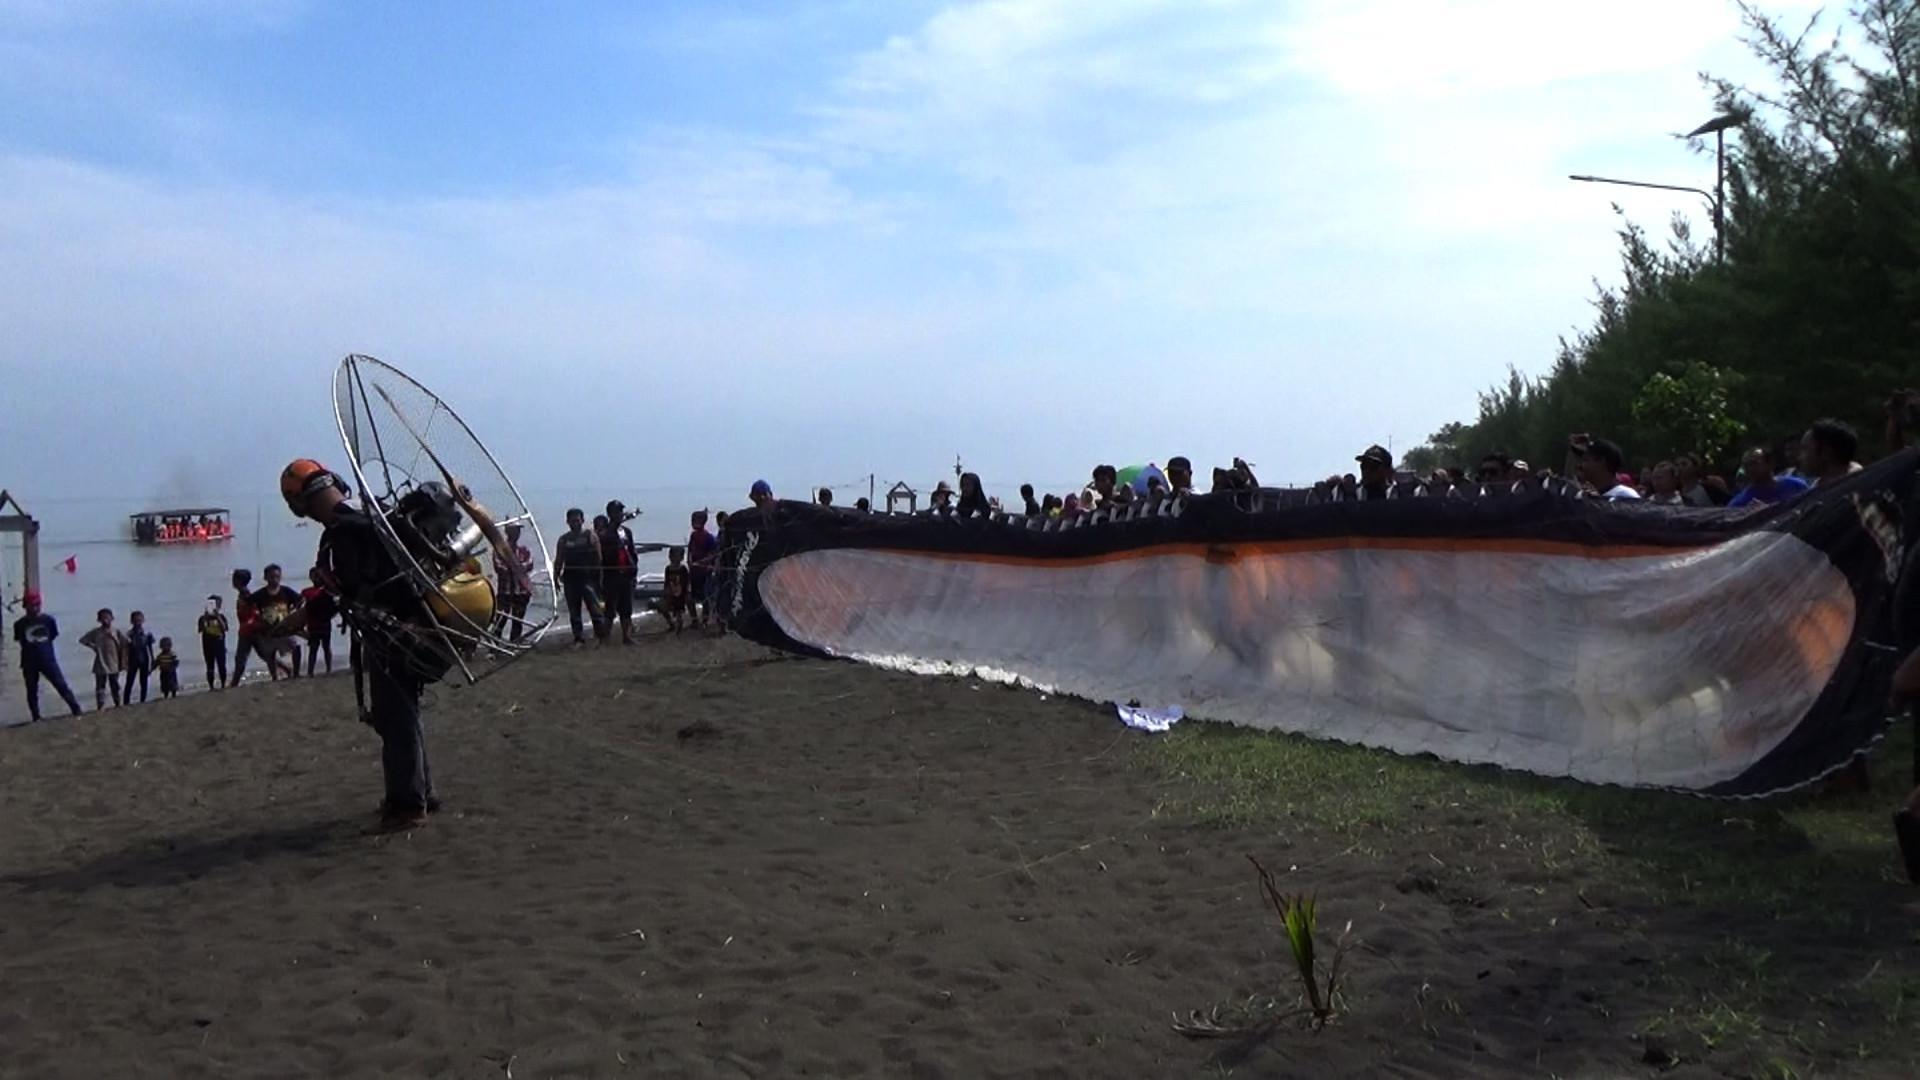 Pantai Duta di Probolinggo, Jawa Timur, memiliki pesona daya ikat tersendiri bagi para wisatawan atau pegiat olahraga ekstrem paralayang. (Liputan6.com/Dian Kurniawan)